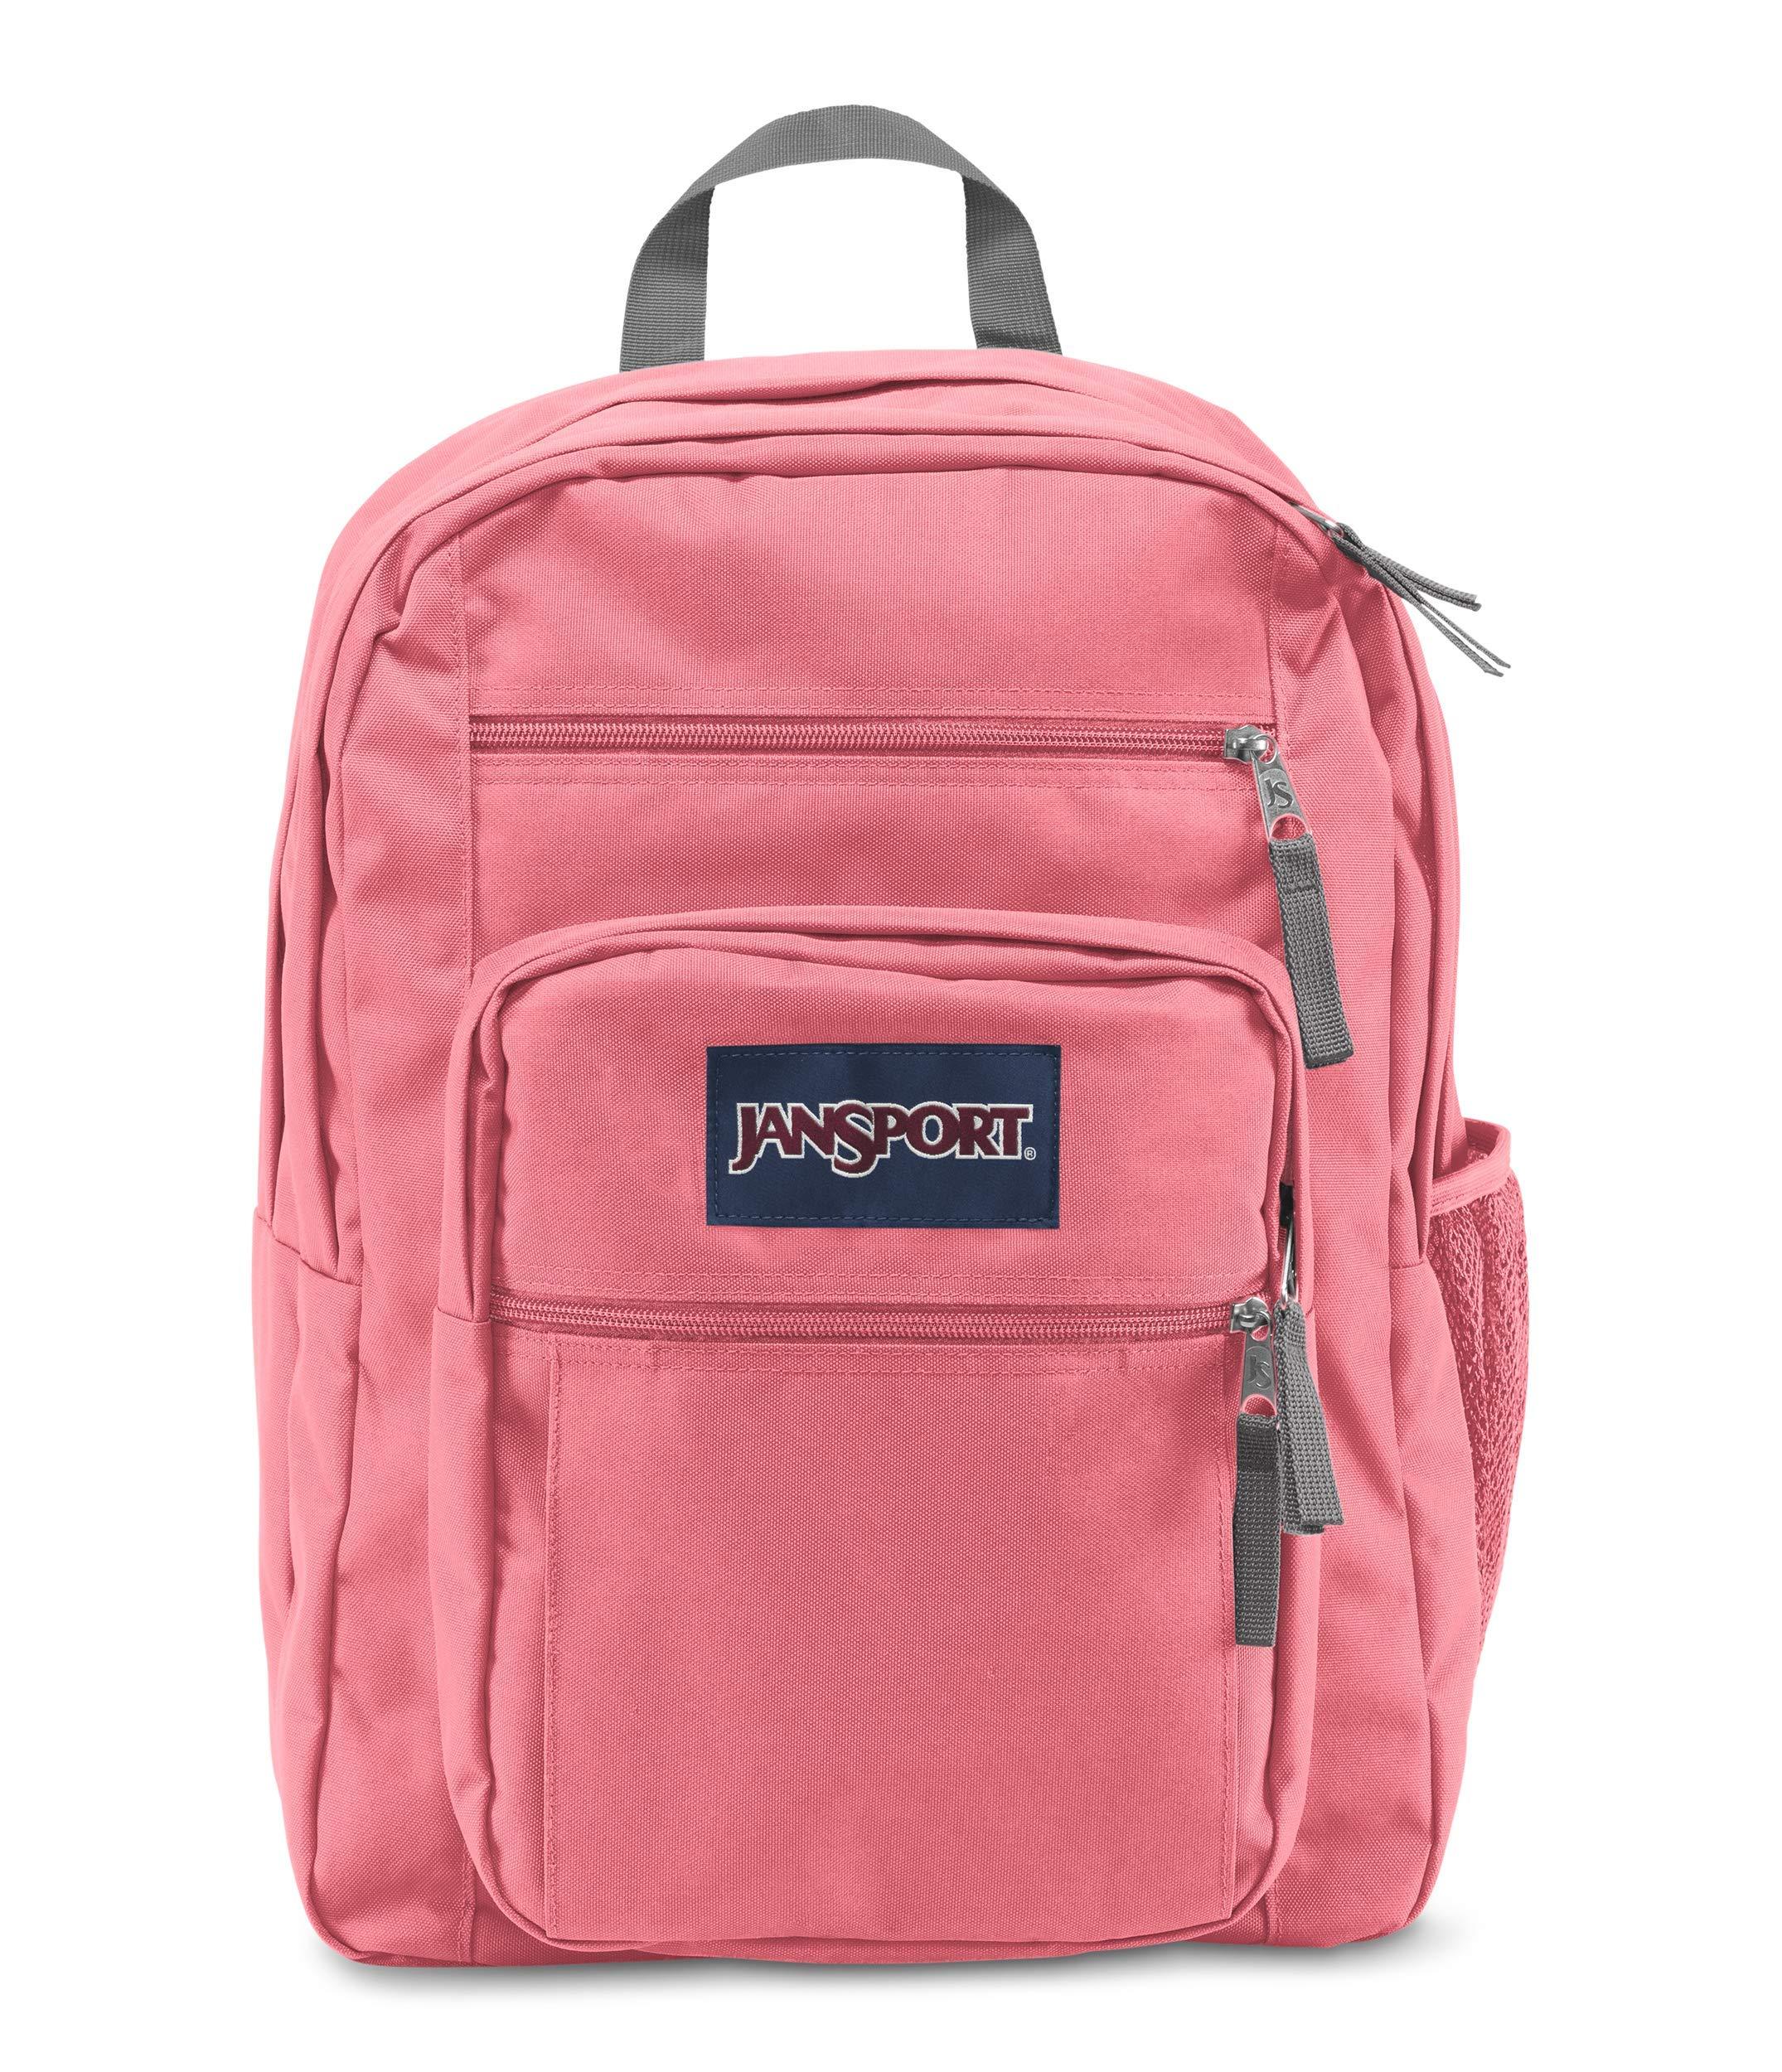 JanSport Big Student Backpack - 15-inch Laptop School Pack, Strawberry Pink by JanSport